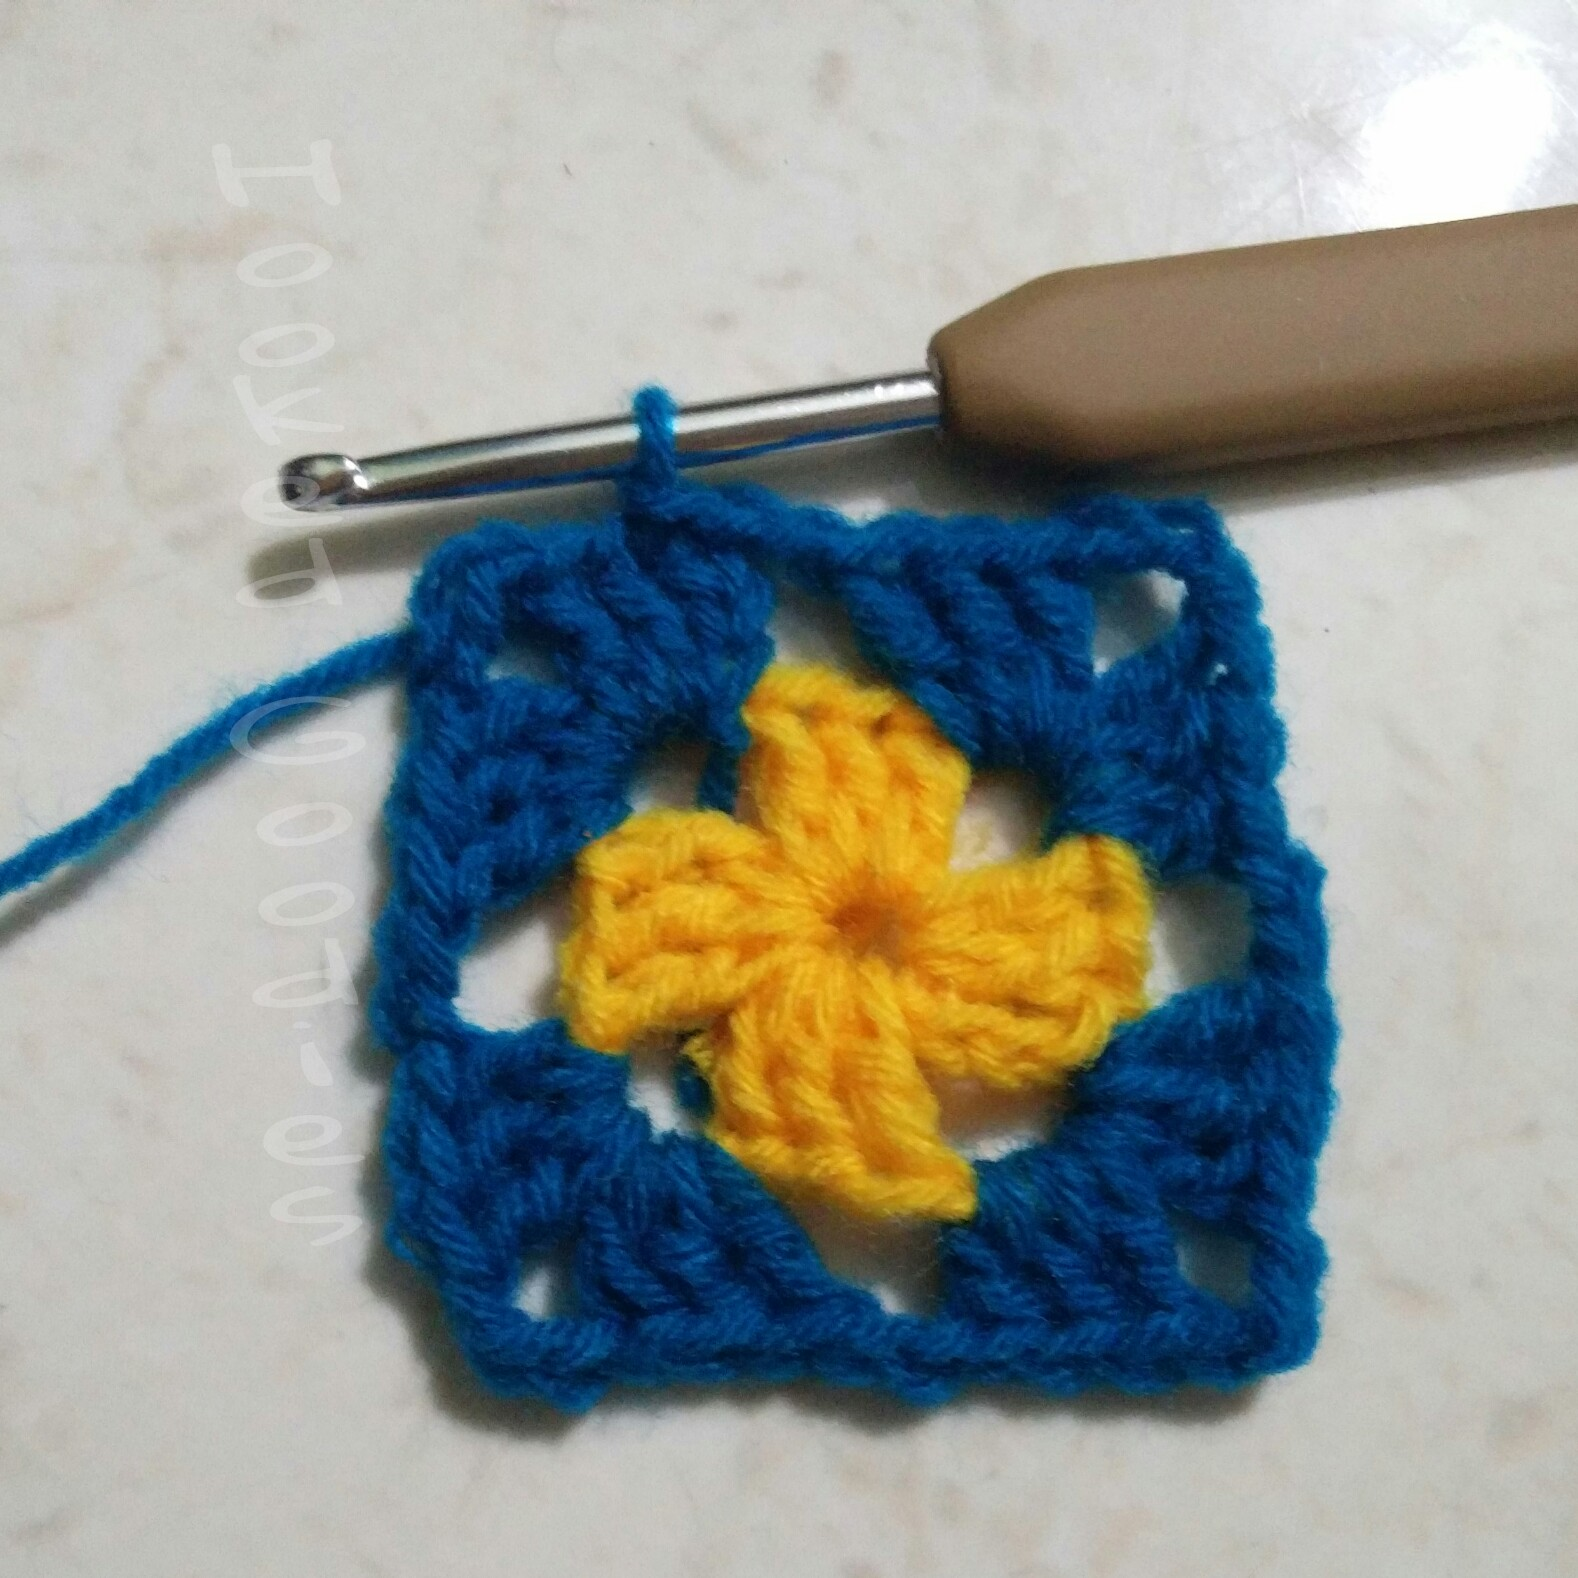 Crochet Basic Granny Square